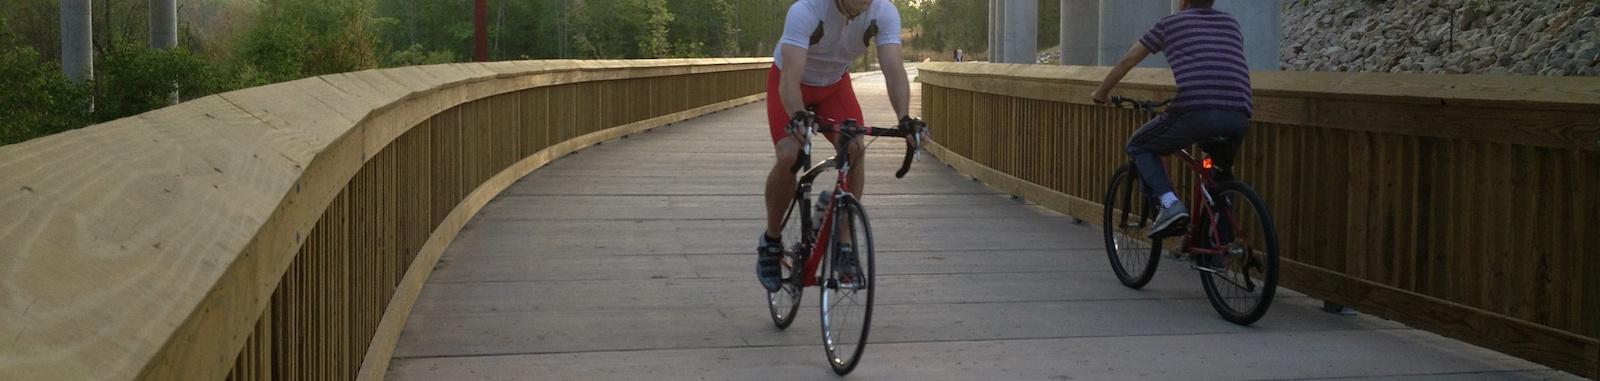 cyclists_on_boardwalk_top_image.jpg